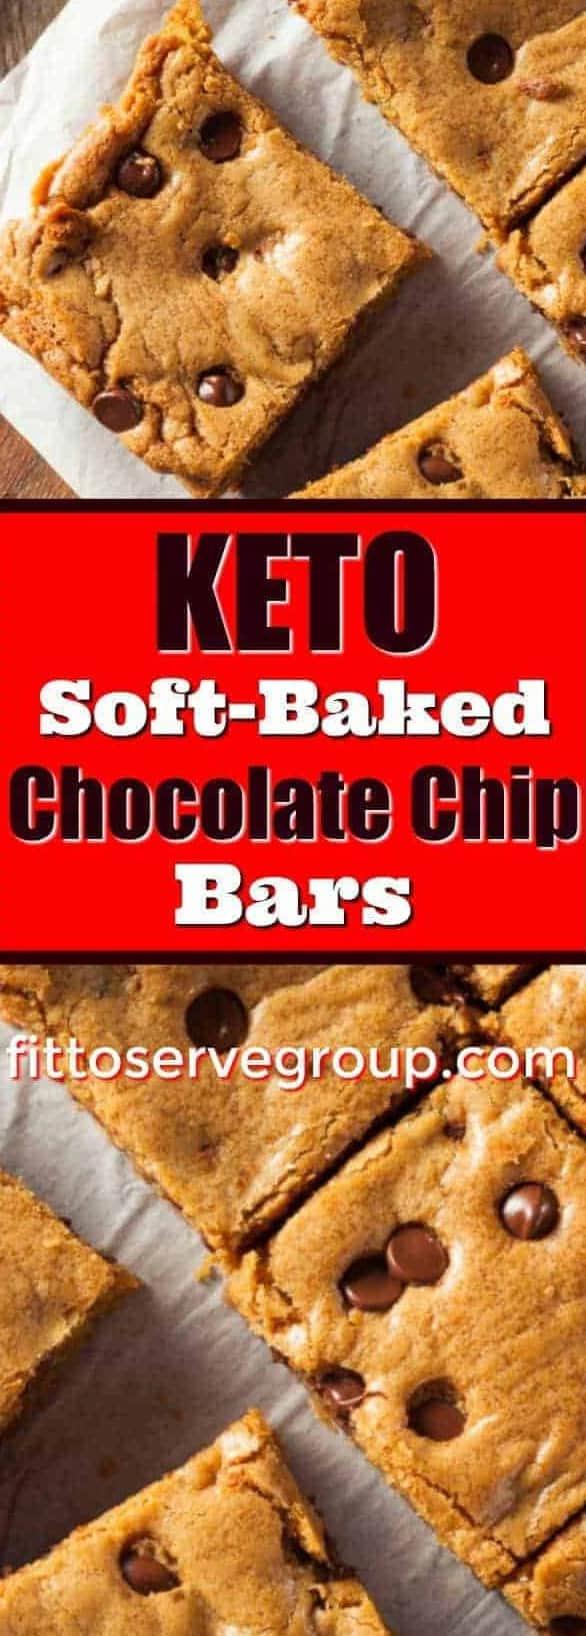 Keto Soft Baked-Chocolate Chip Bars